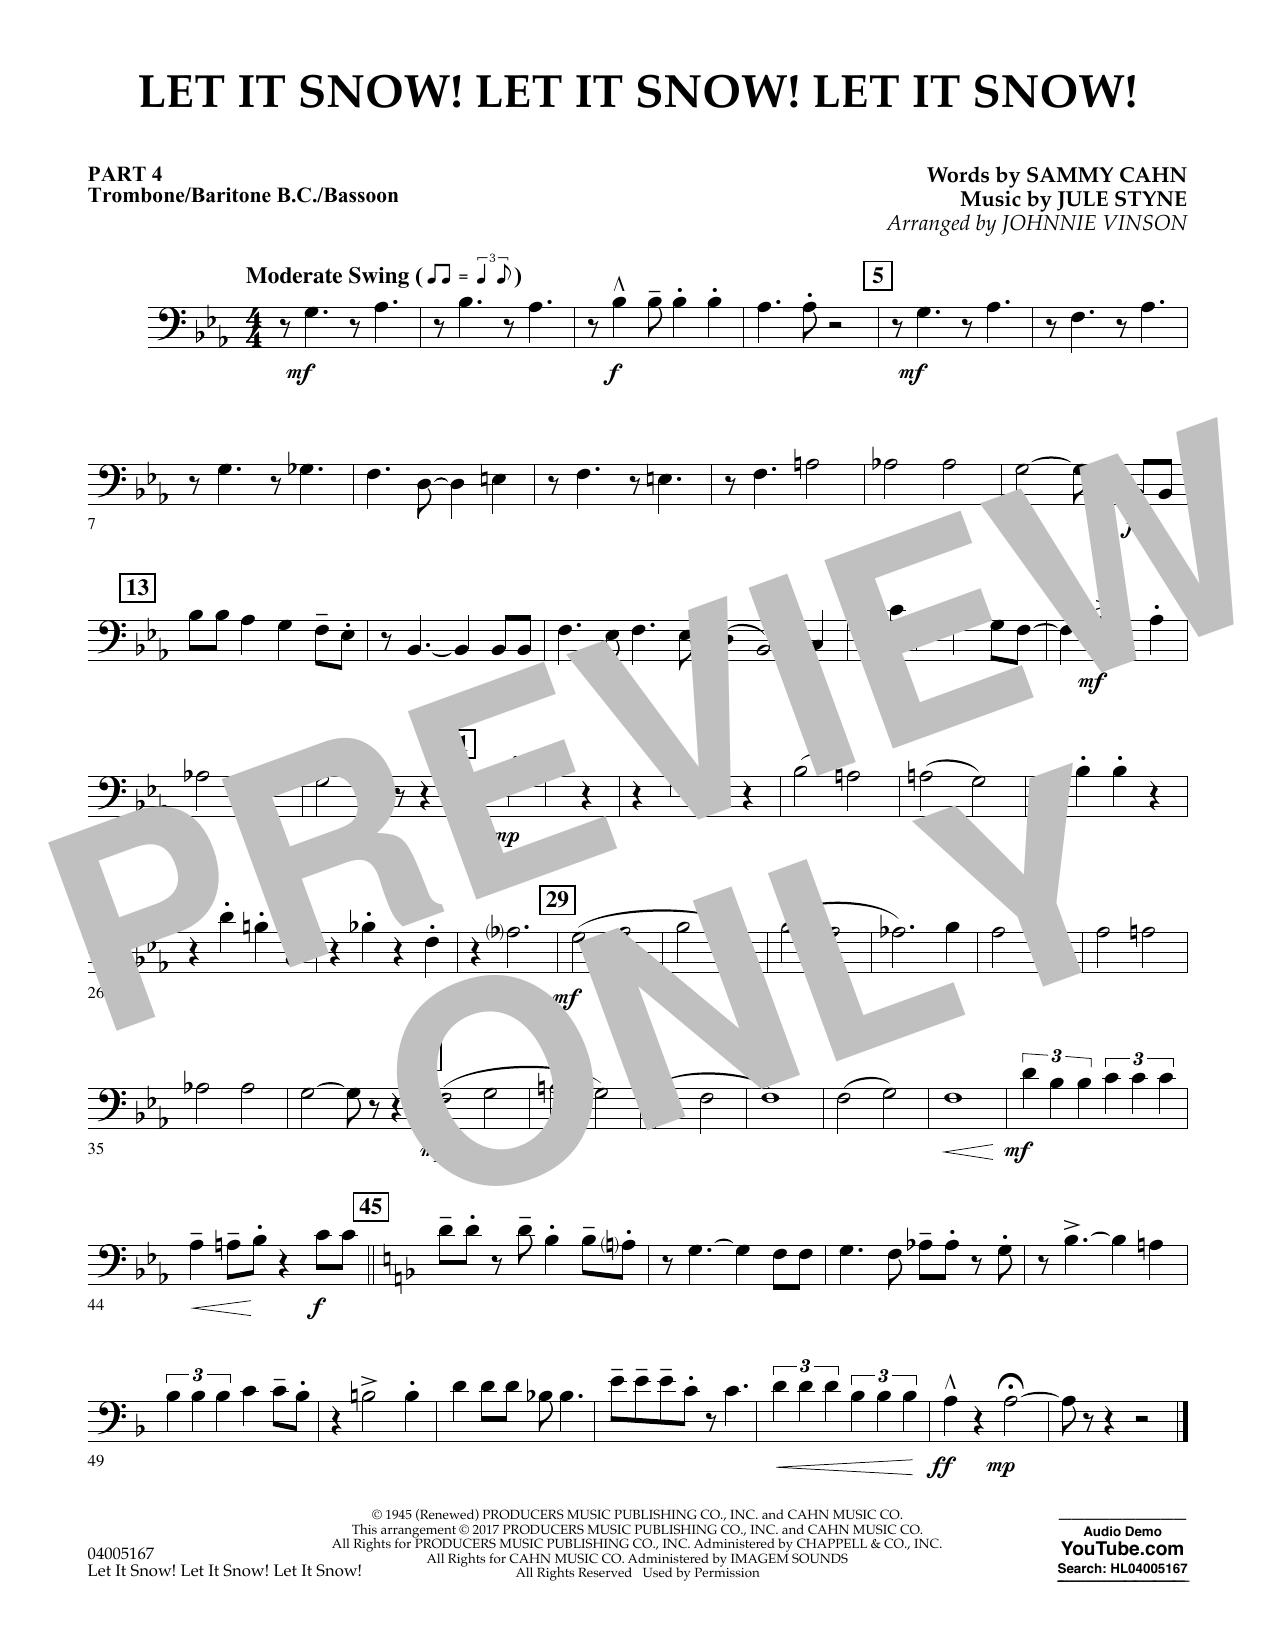 Let It Snow! Let It Snow! Let It Snow! - Pt.4 - Trombone/Bar. B.C./Bsn. (Concert Band)